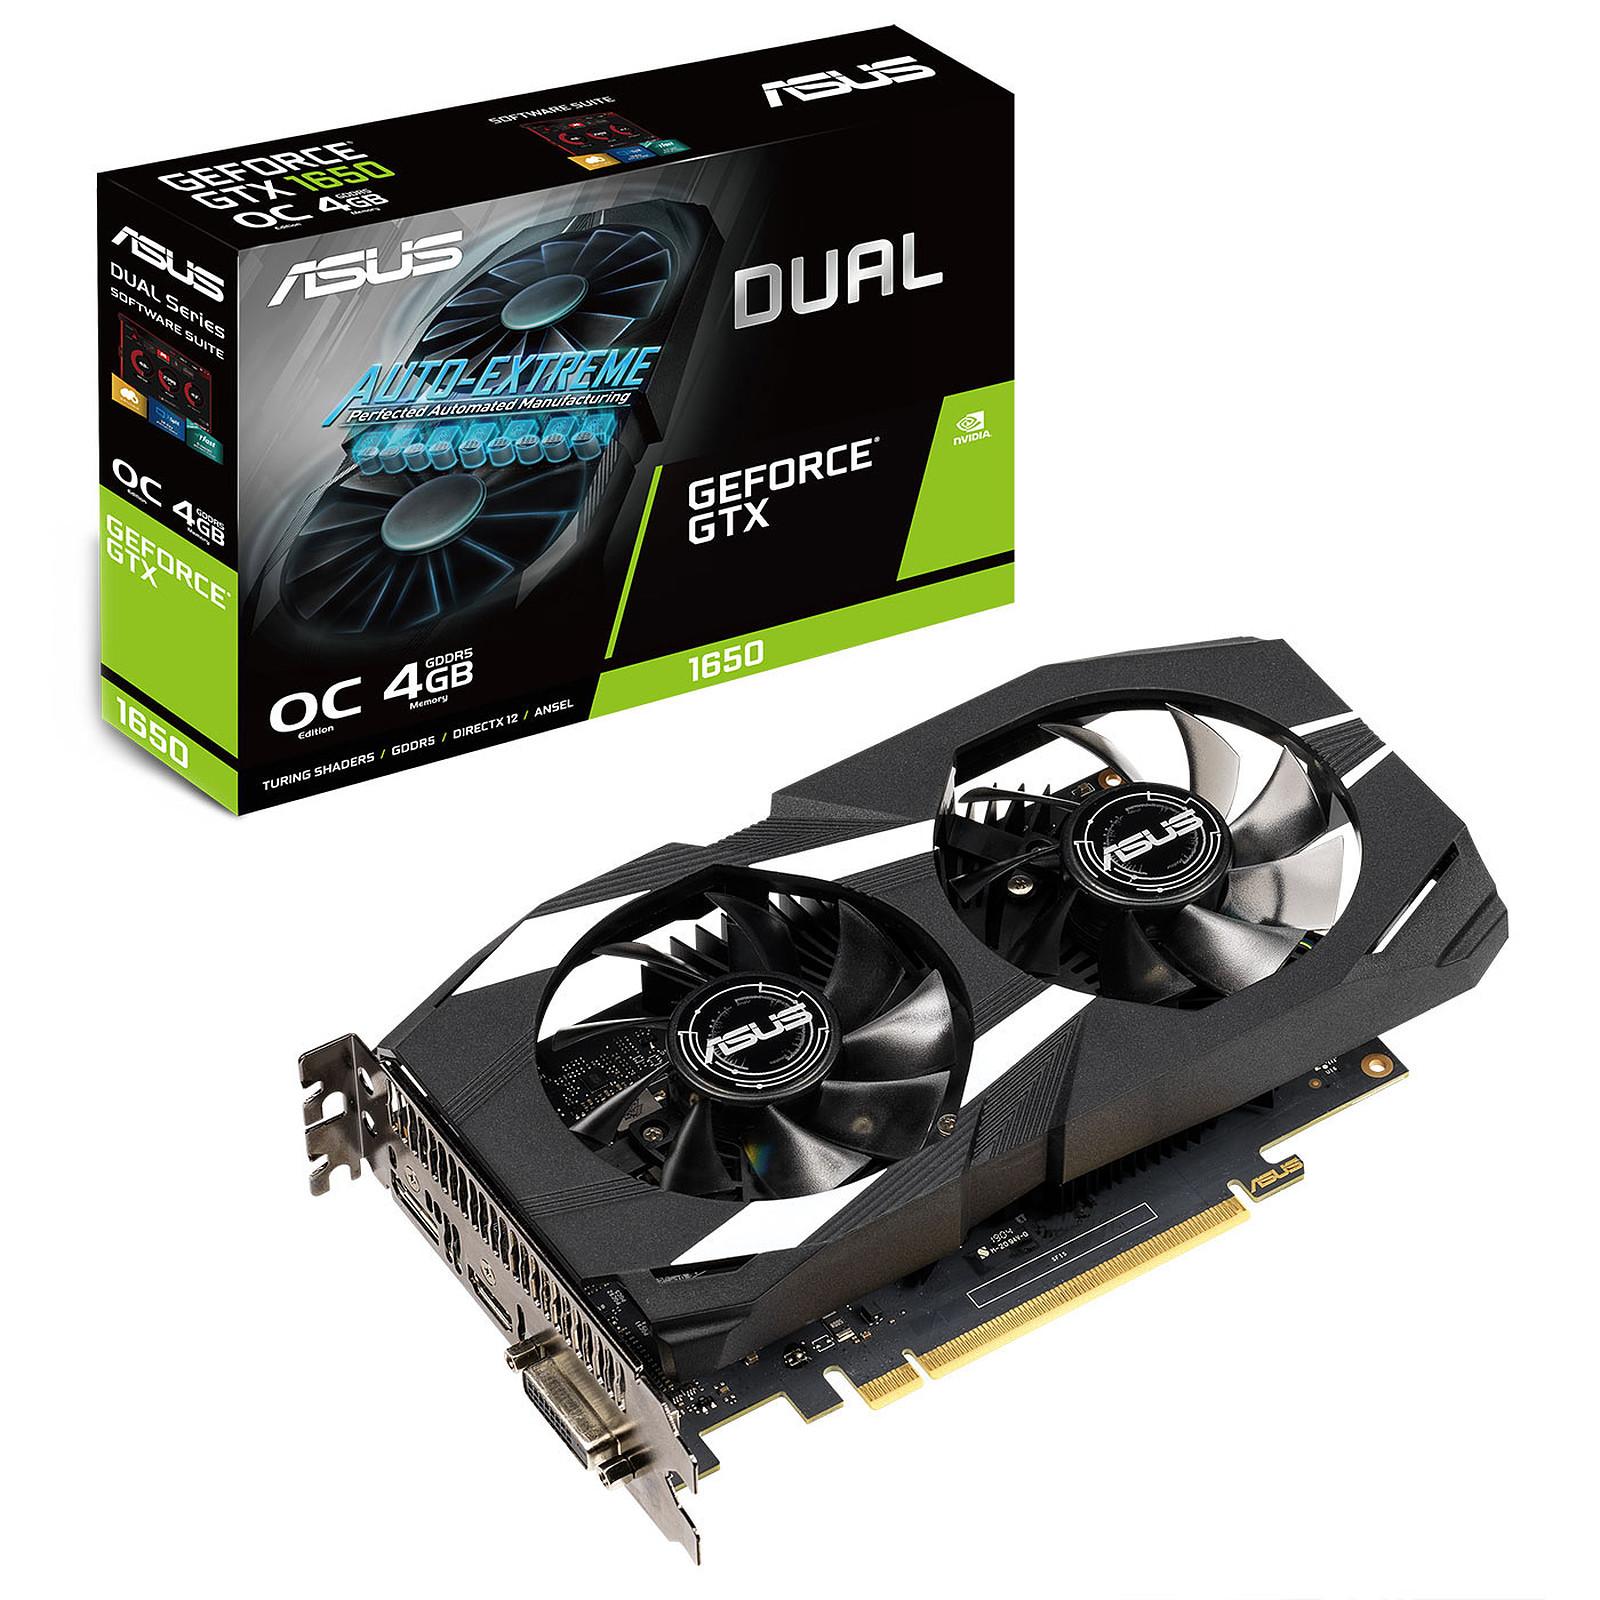 ASUS GeForce GTX 1650 DUAL-GTX1650-O4G